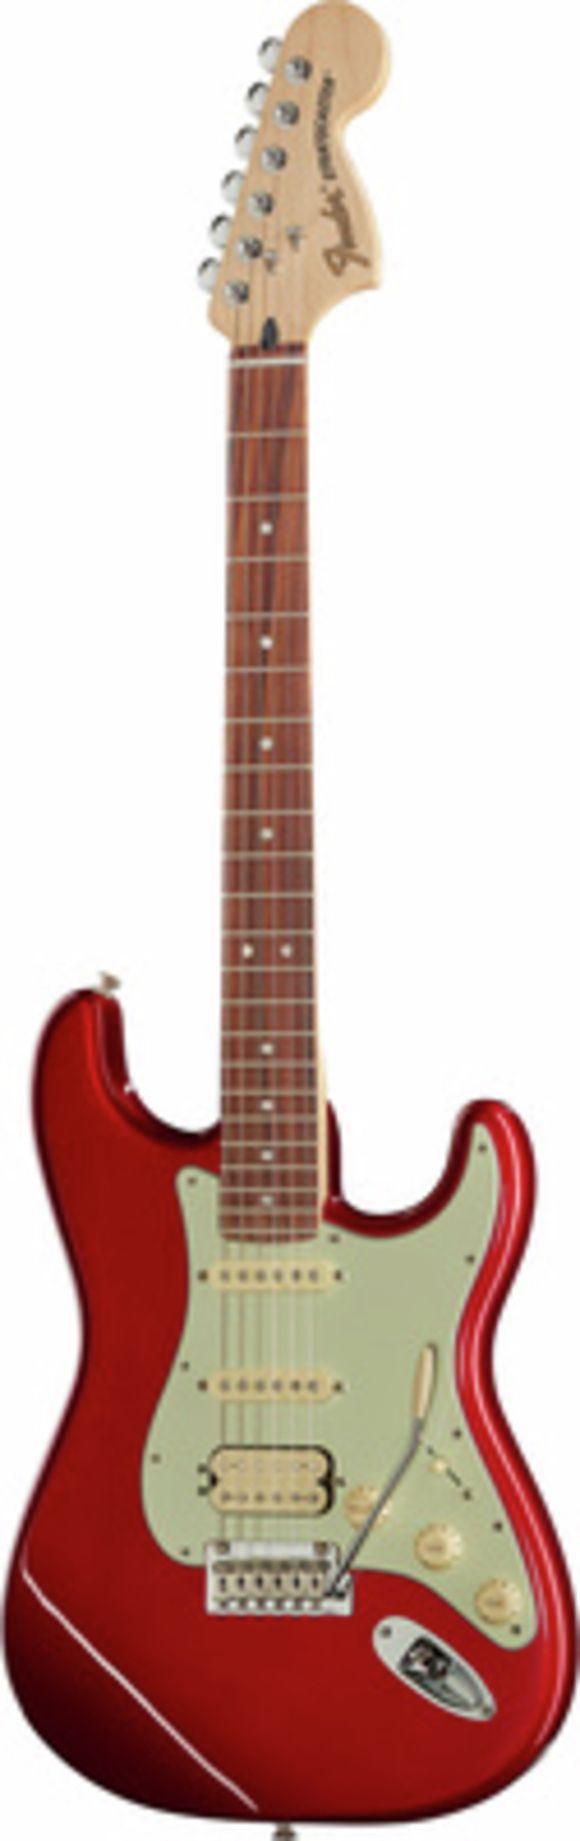 Deluxe Strat HSS PF CAR Fender